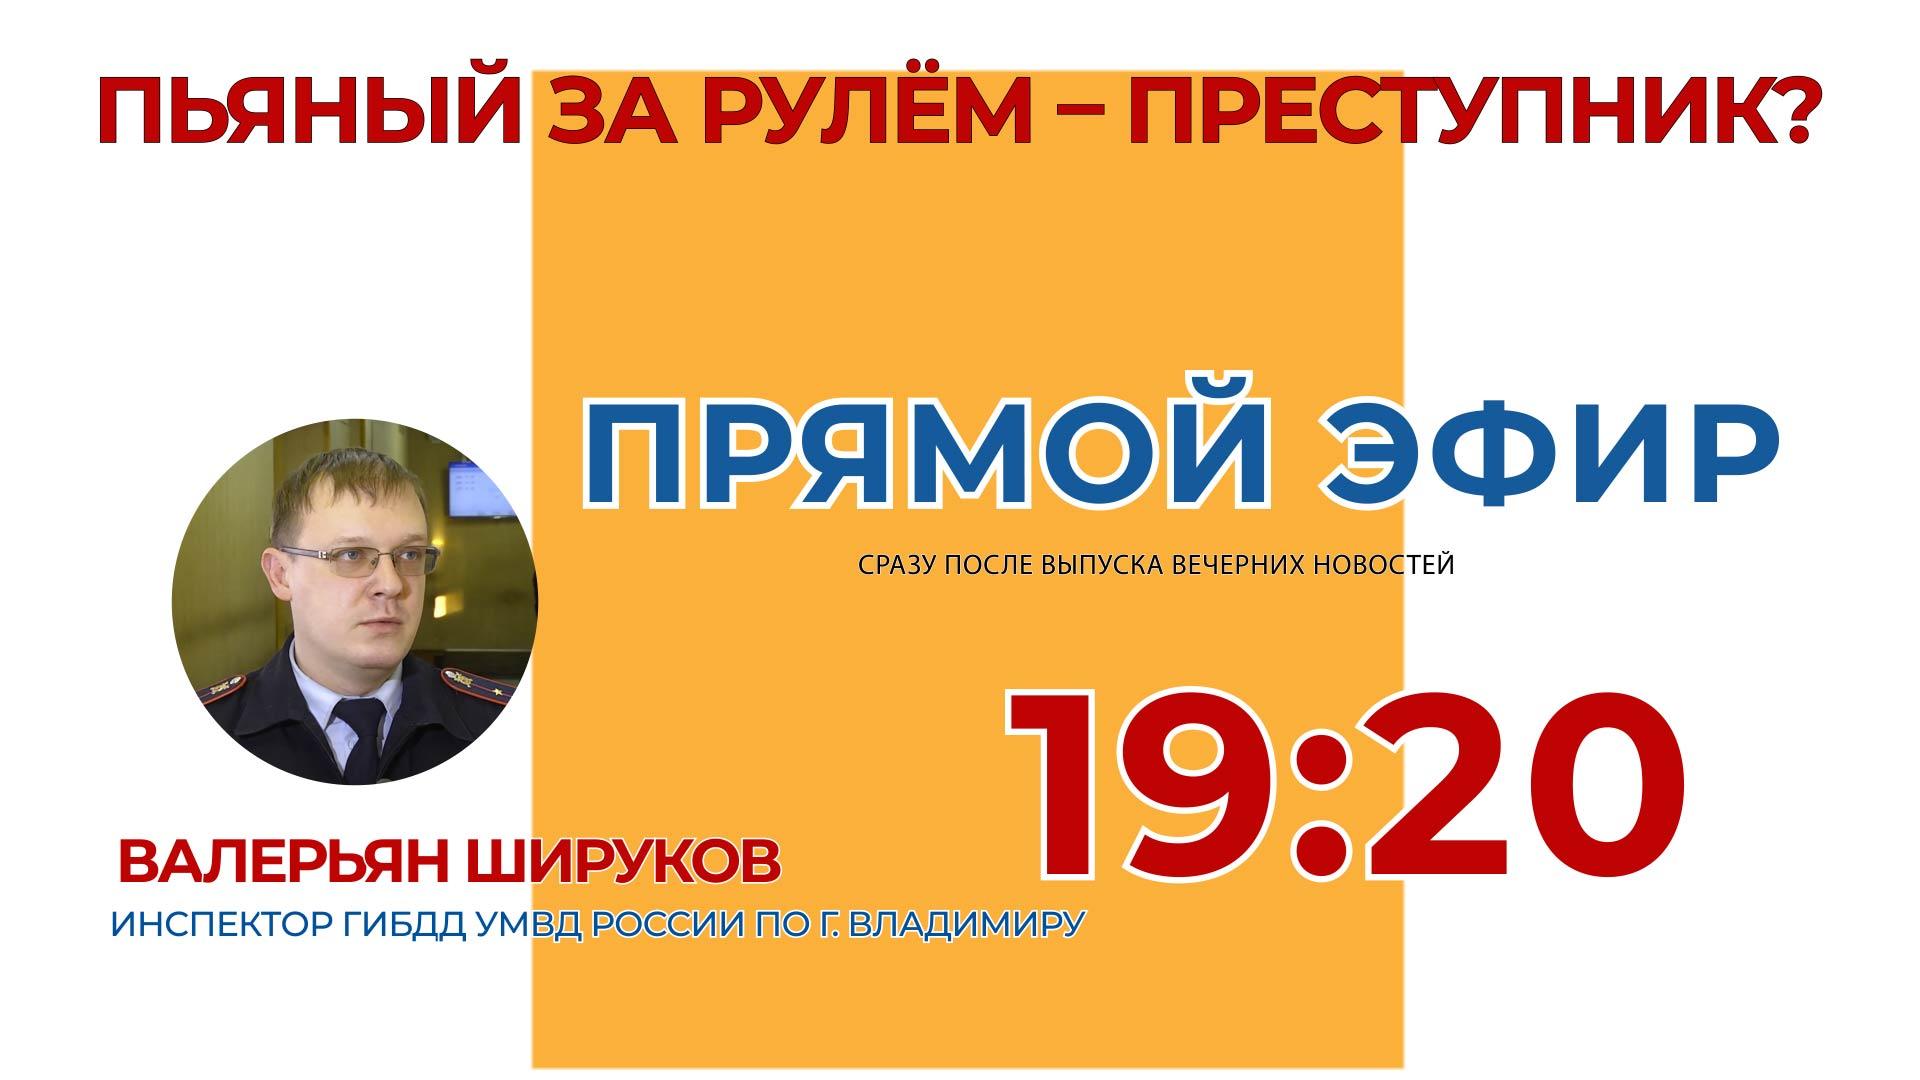 шируков_1111_00000